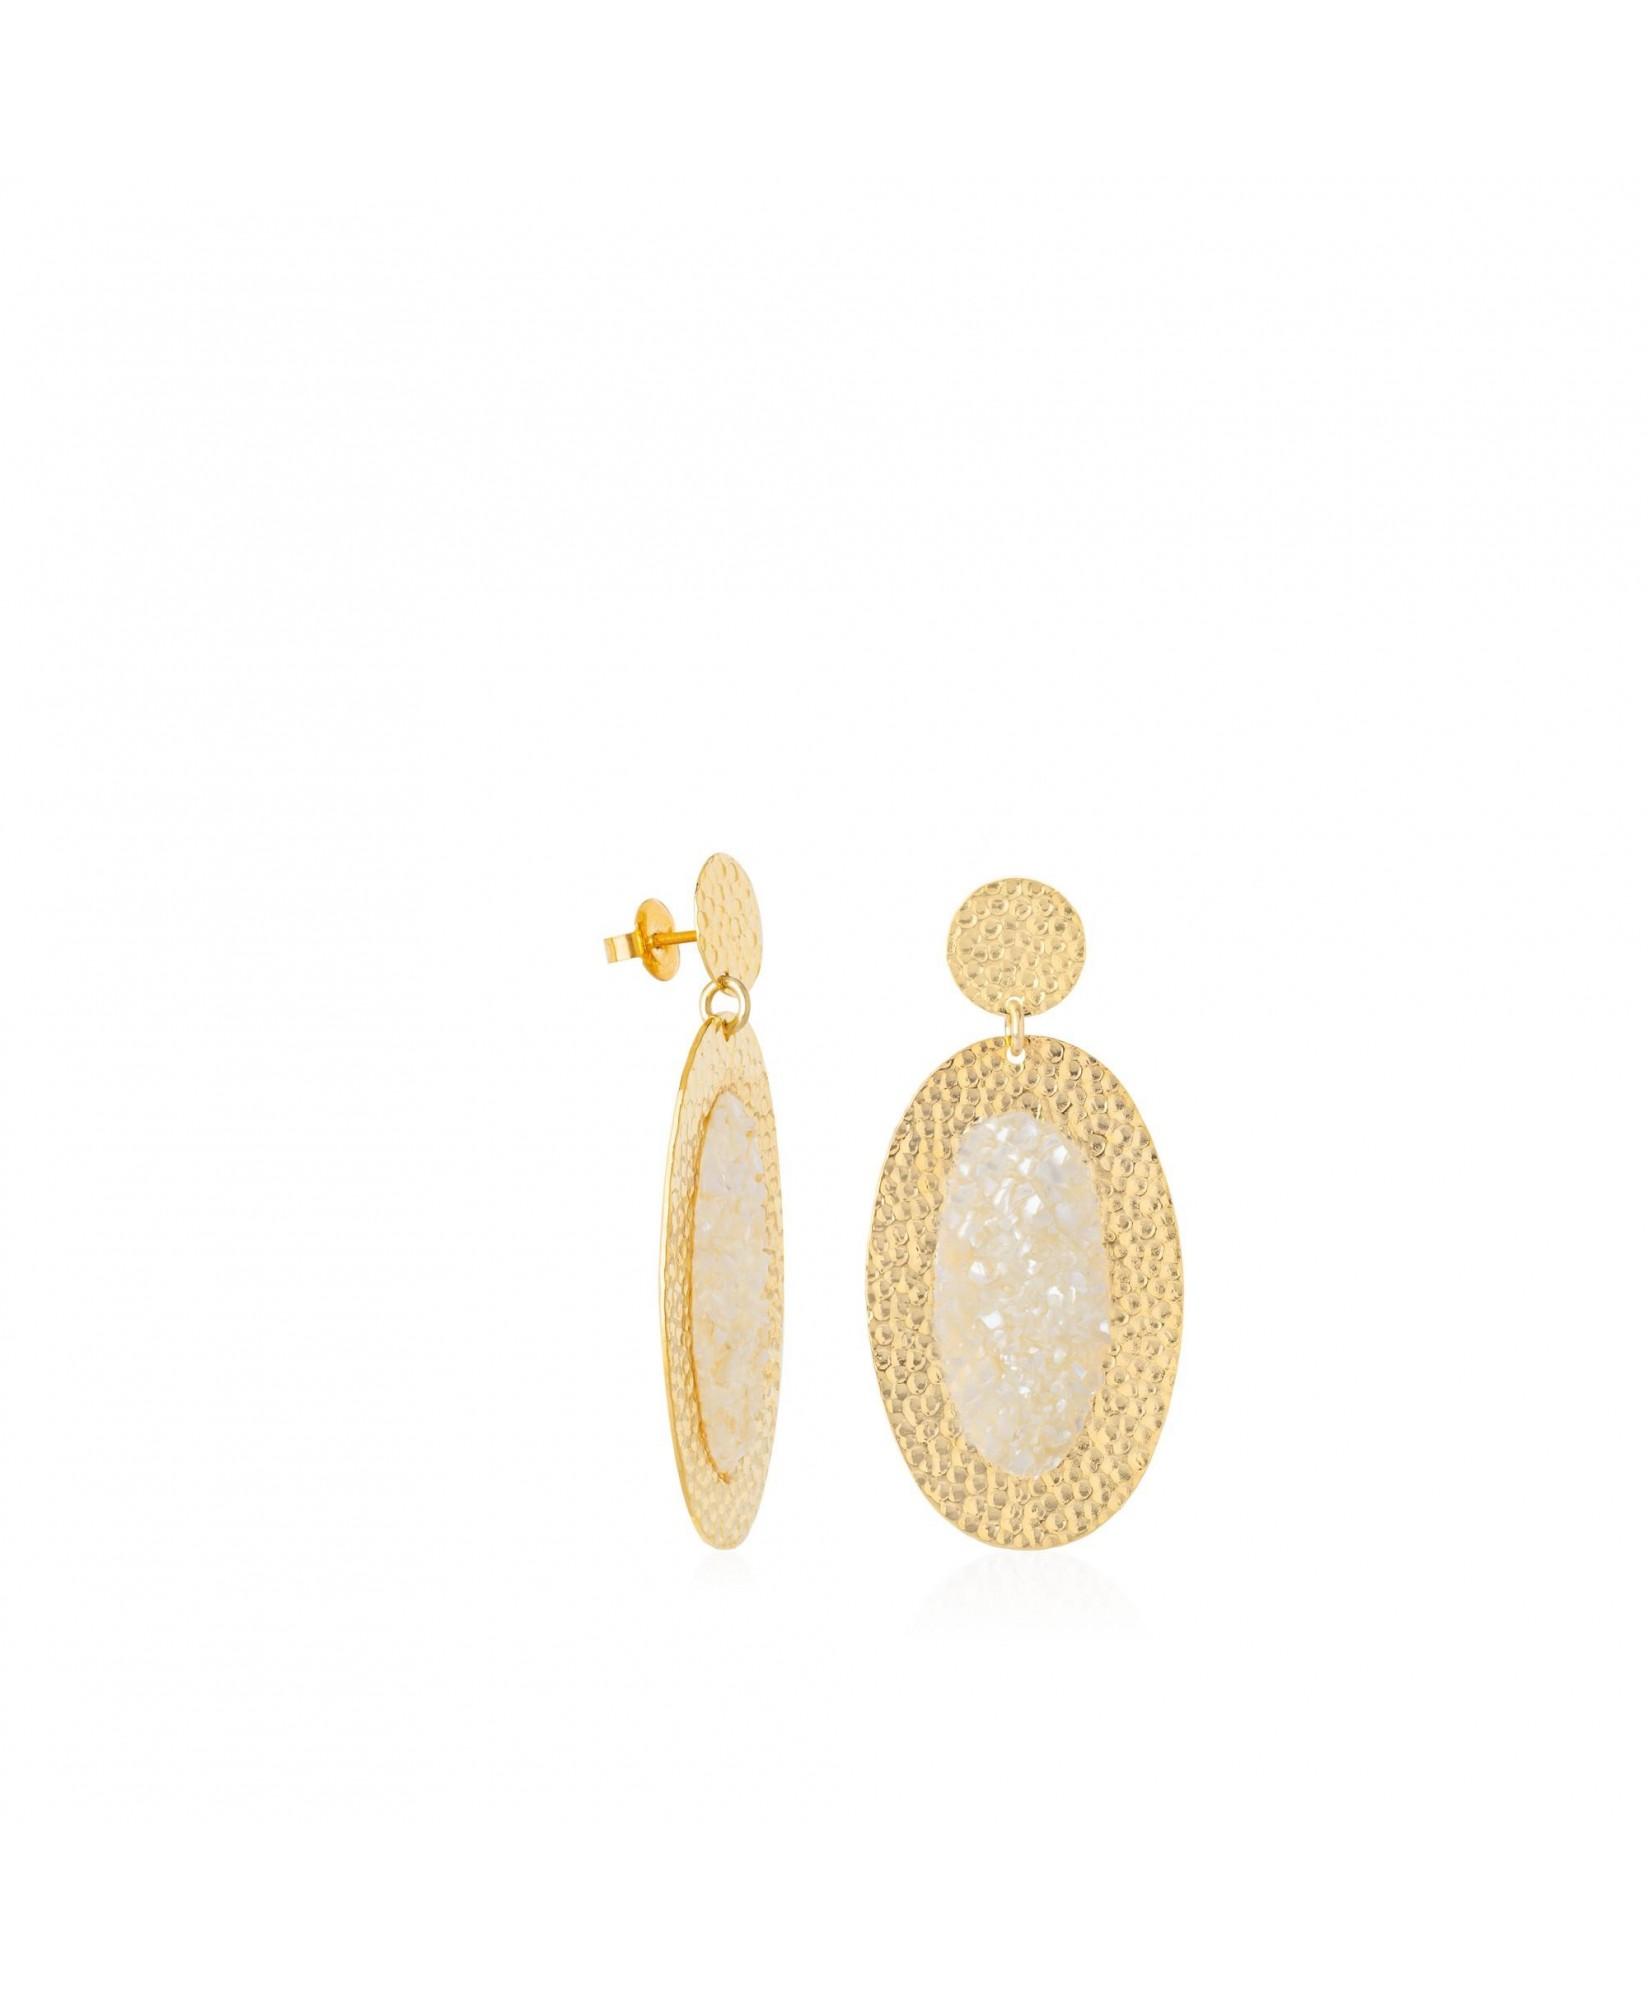 Pendientes ovalados oro Afrodita con nácar blanco Pendientes ovalados oro Afrodita con nácar blanco